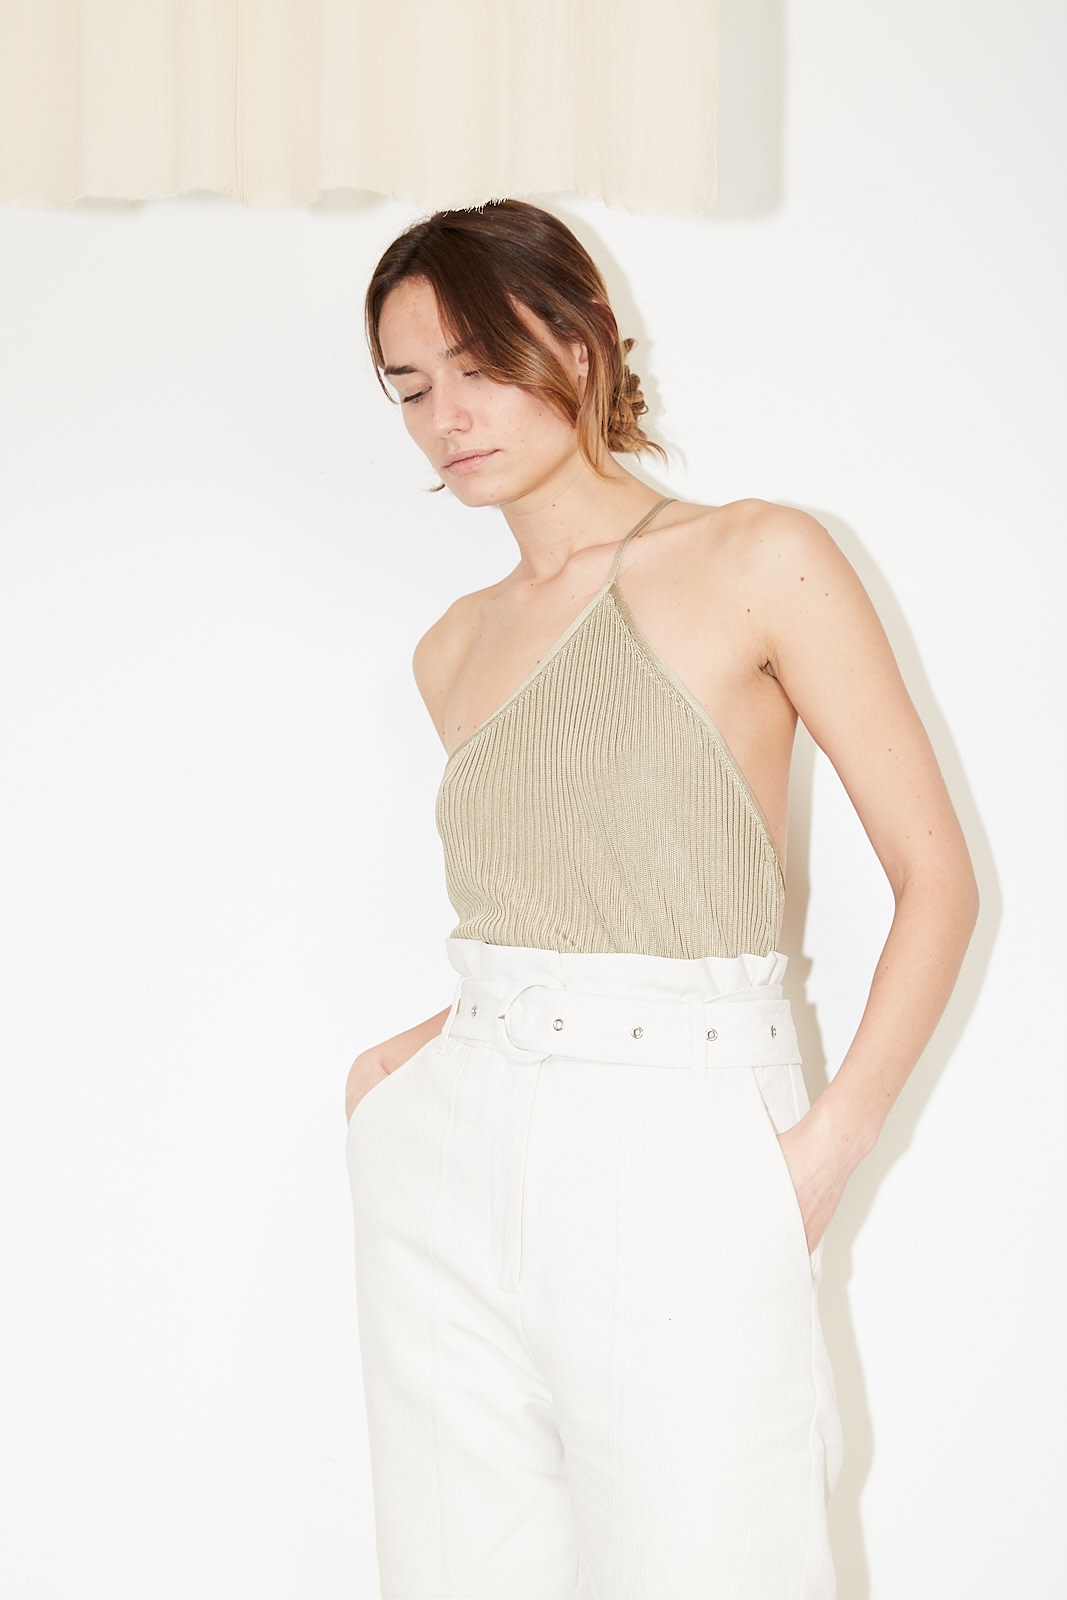 Aeron - Adage fine knit top